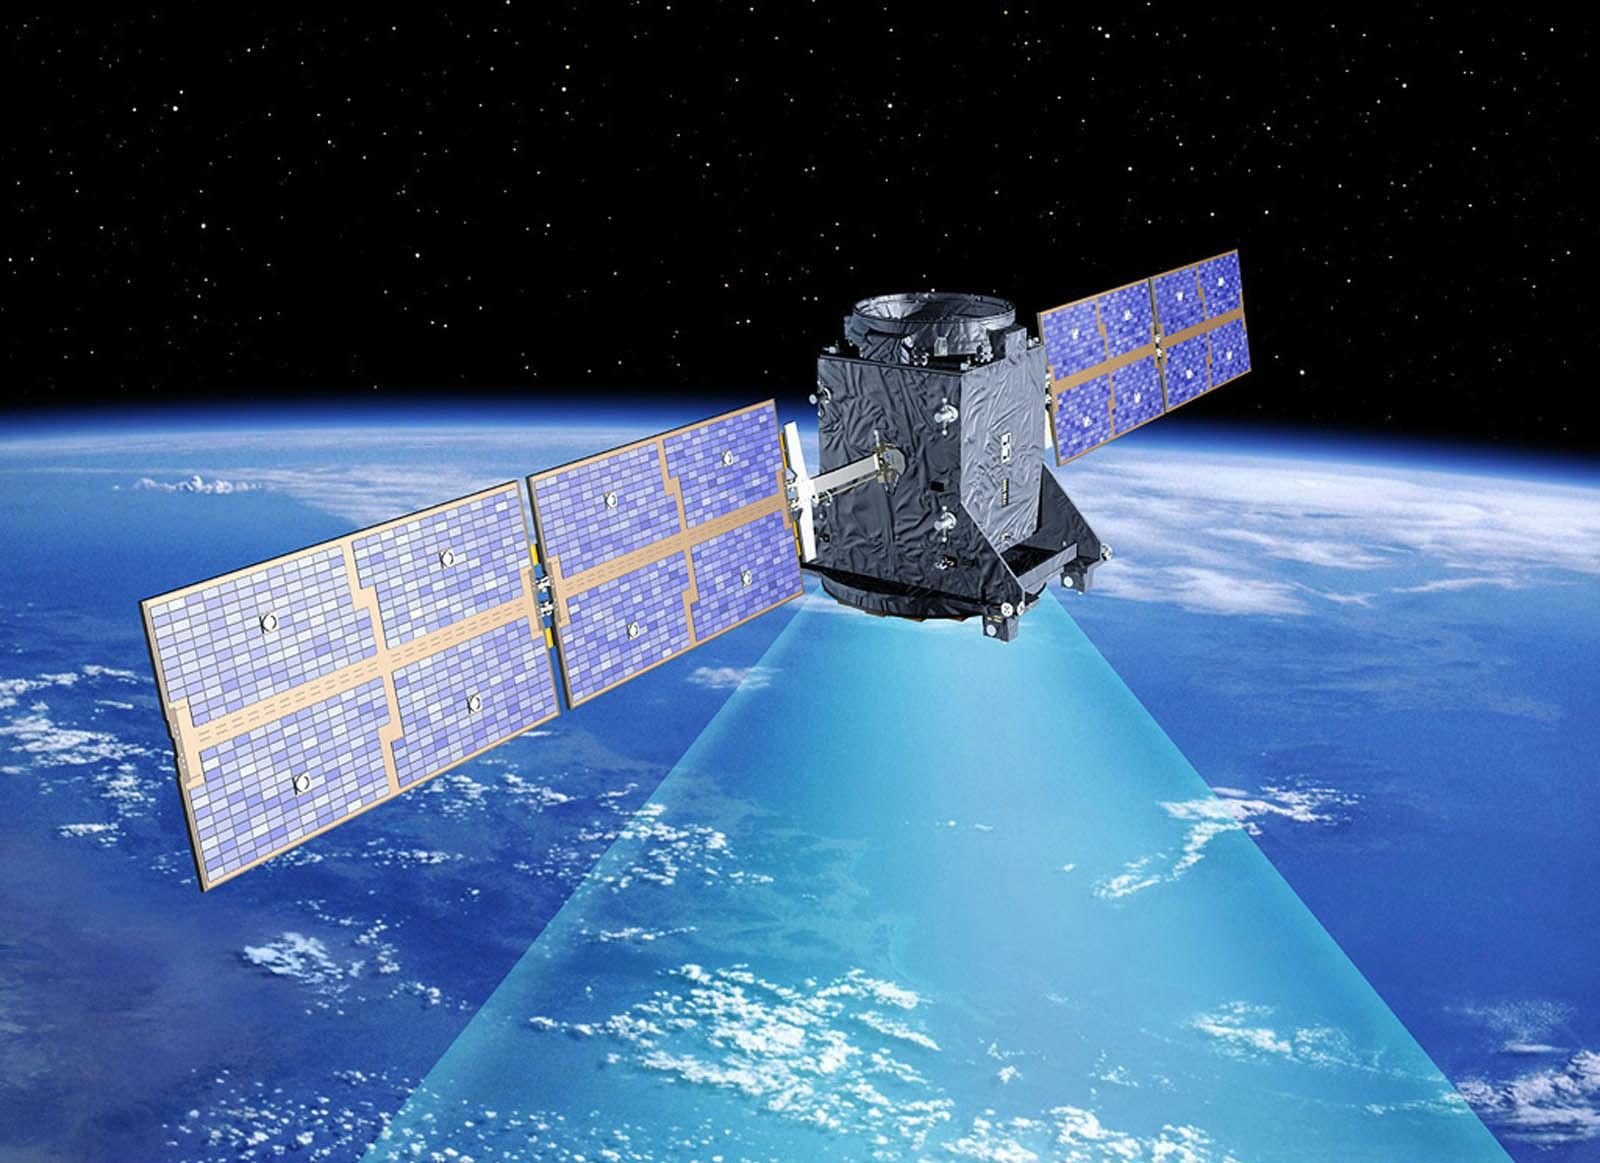 КНР запустит спутник Shijian-13 наорбиту весной